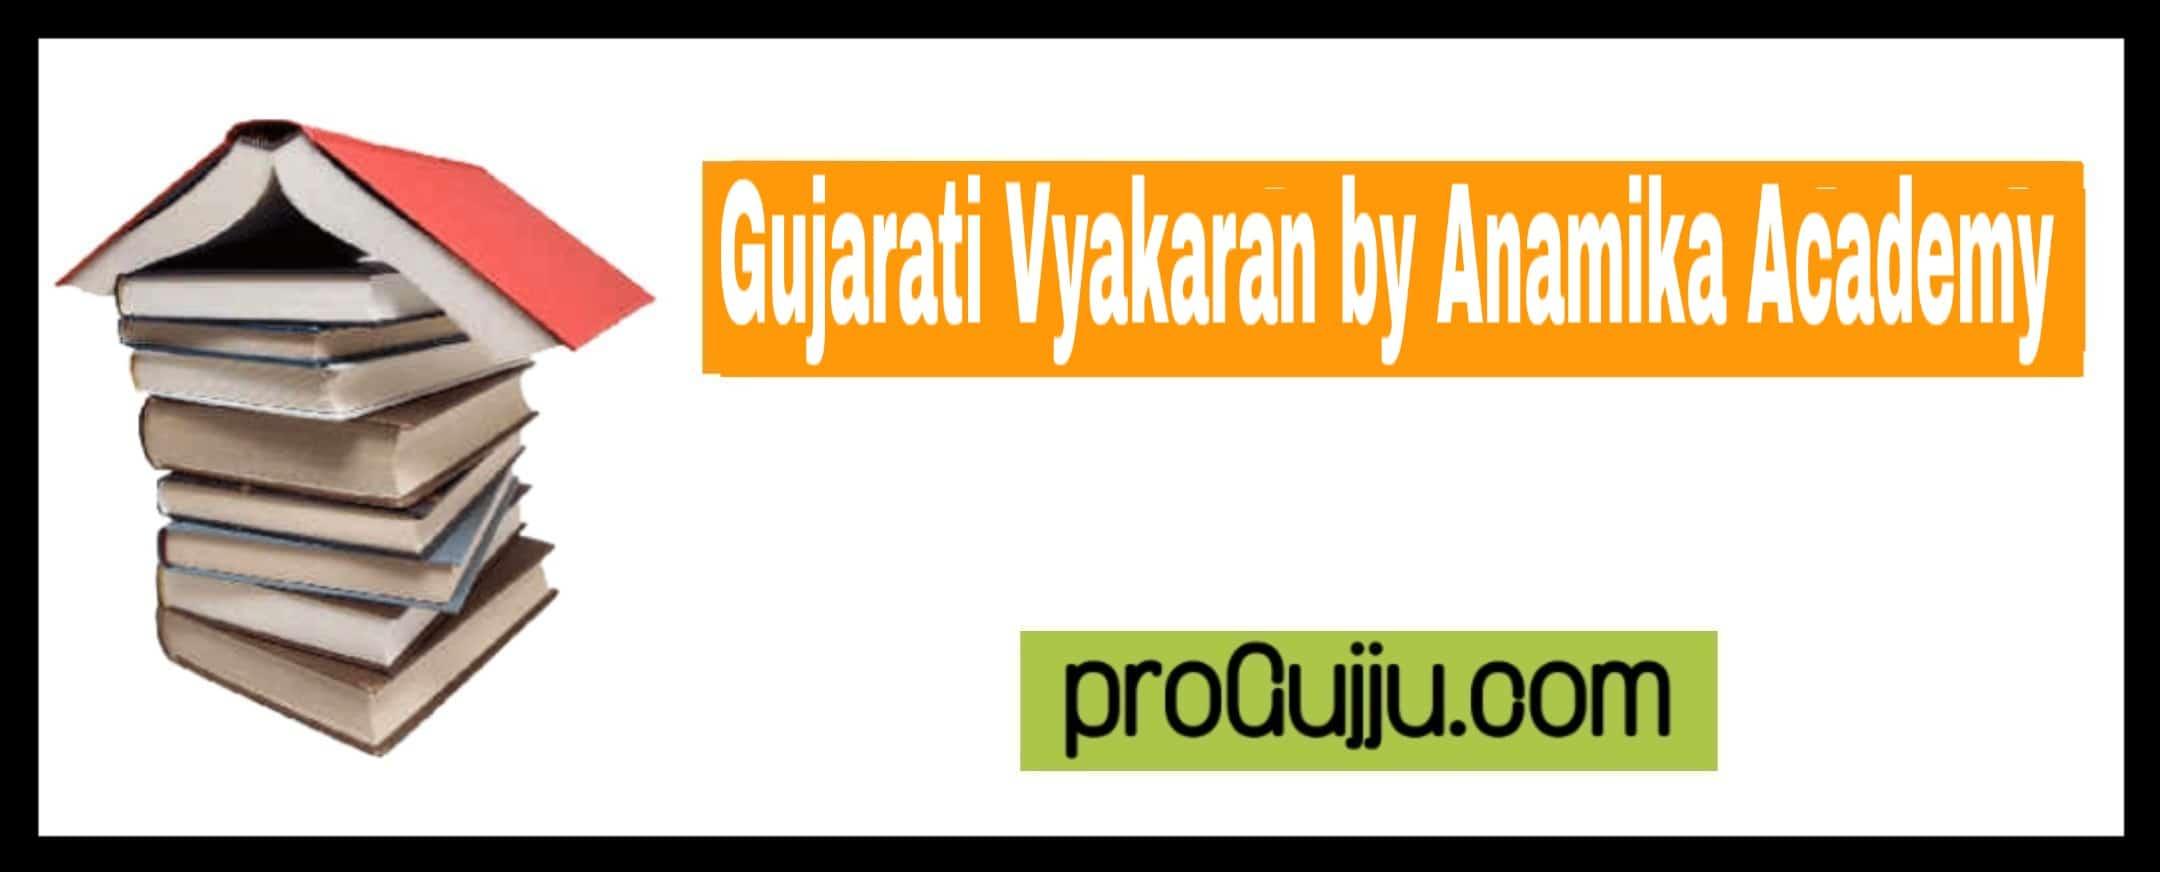 Gujarati Vyakaran by Anamika Academy